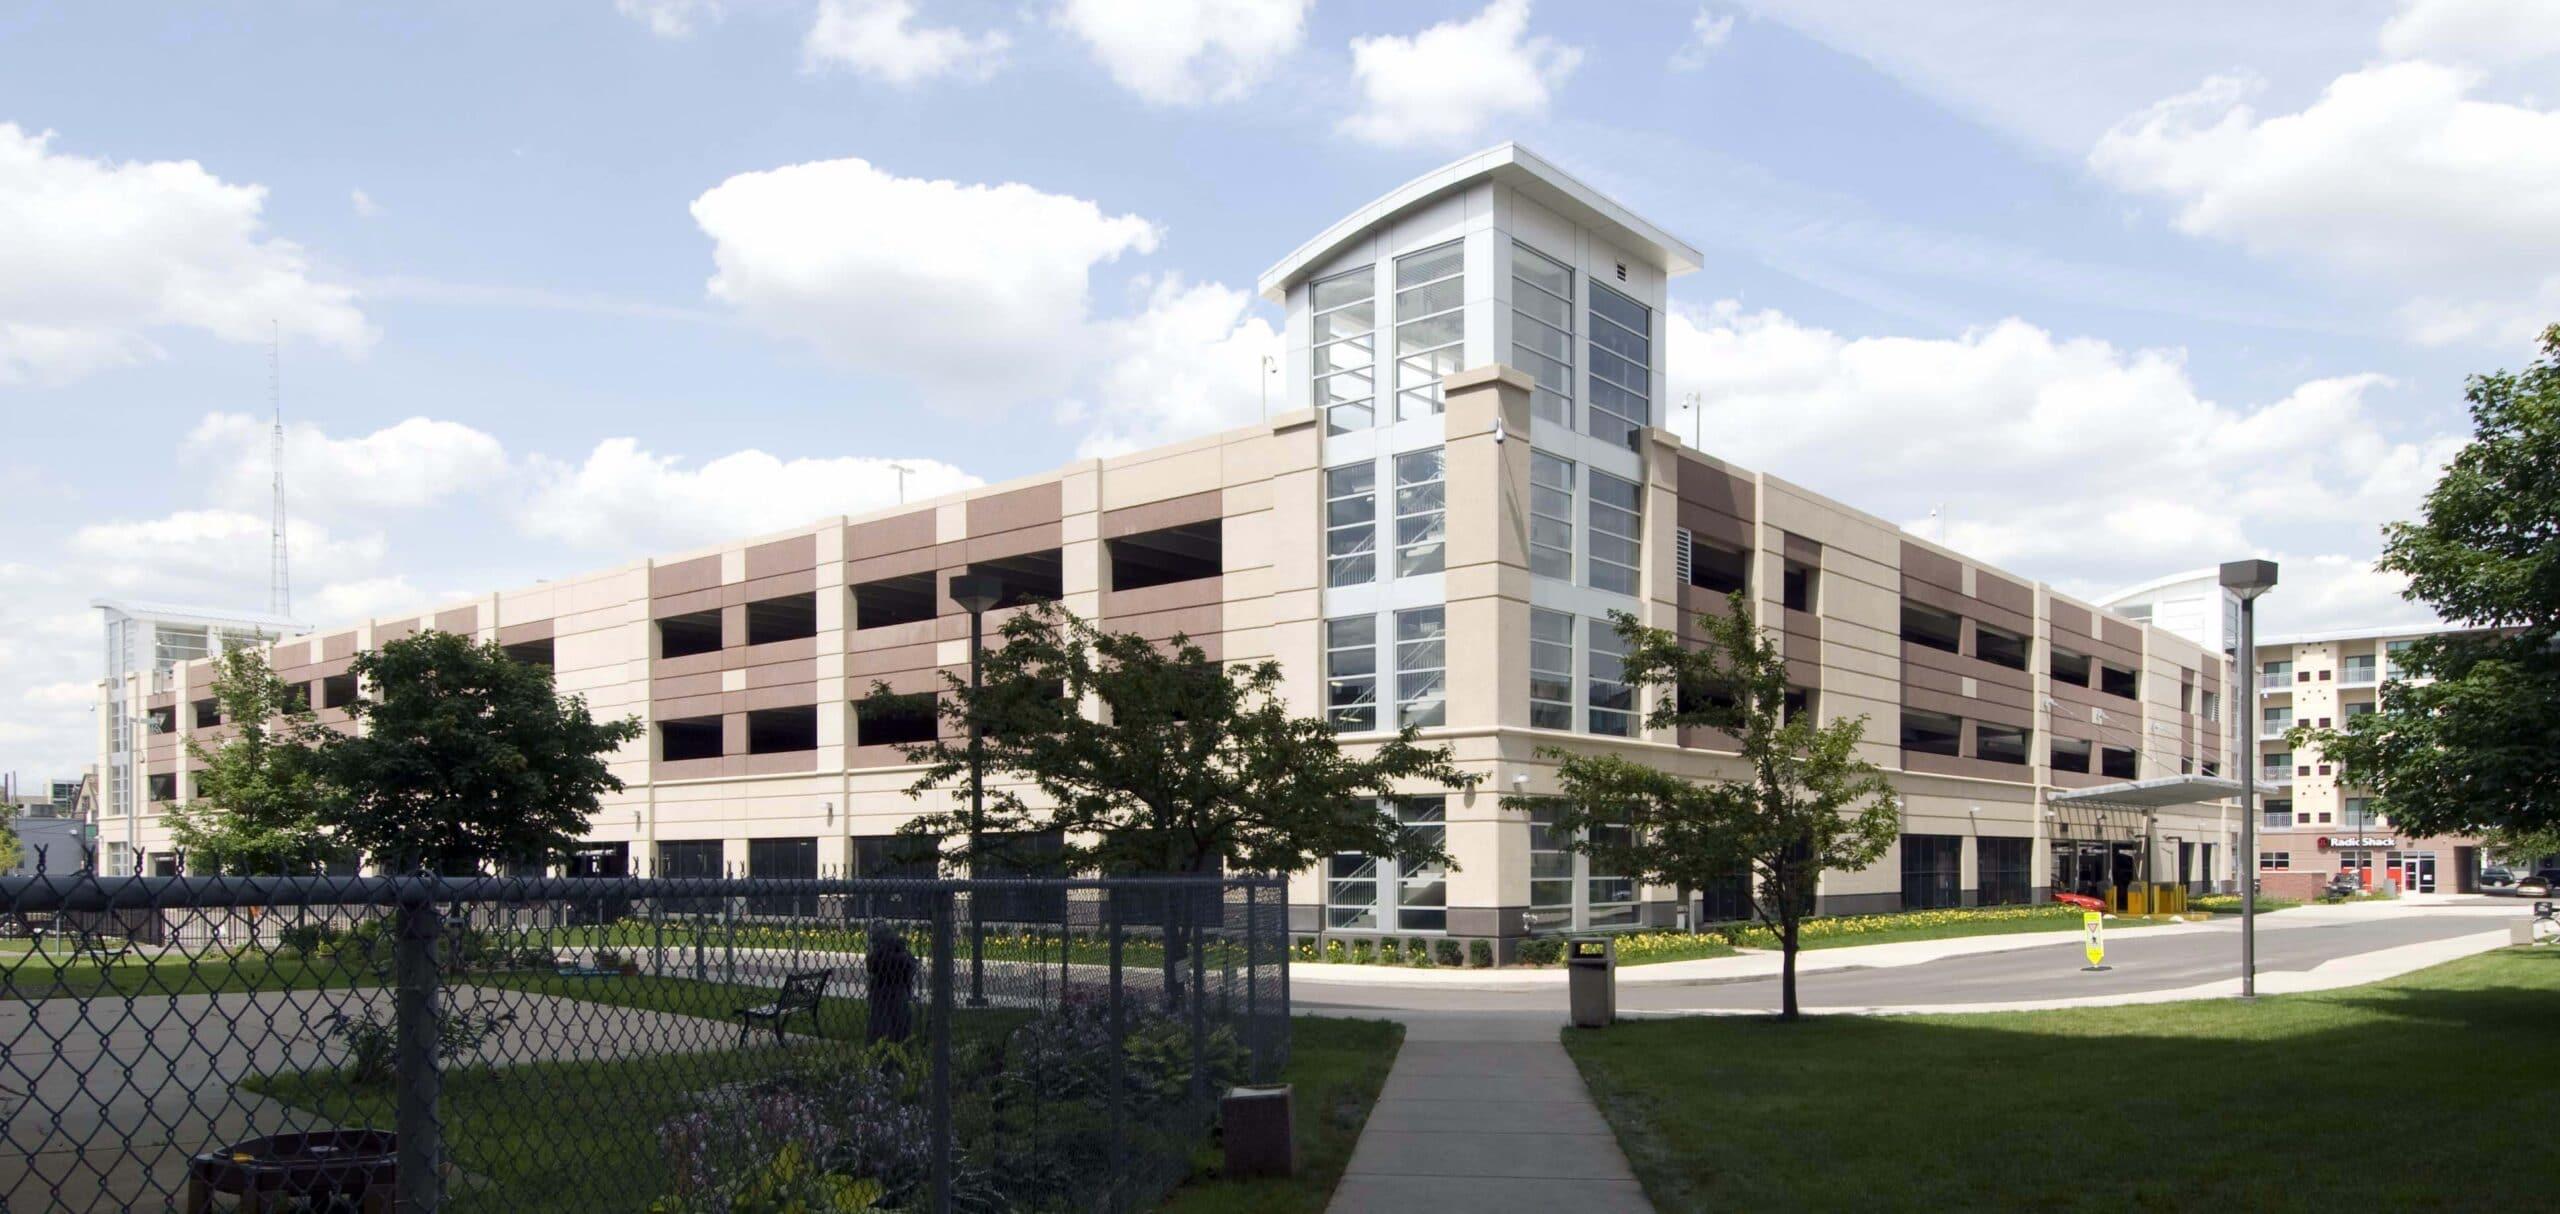 Wayne State University South Village Parking Structure